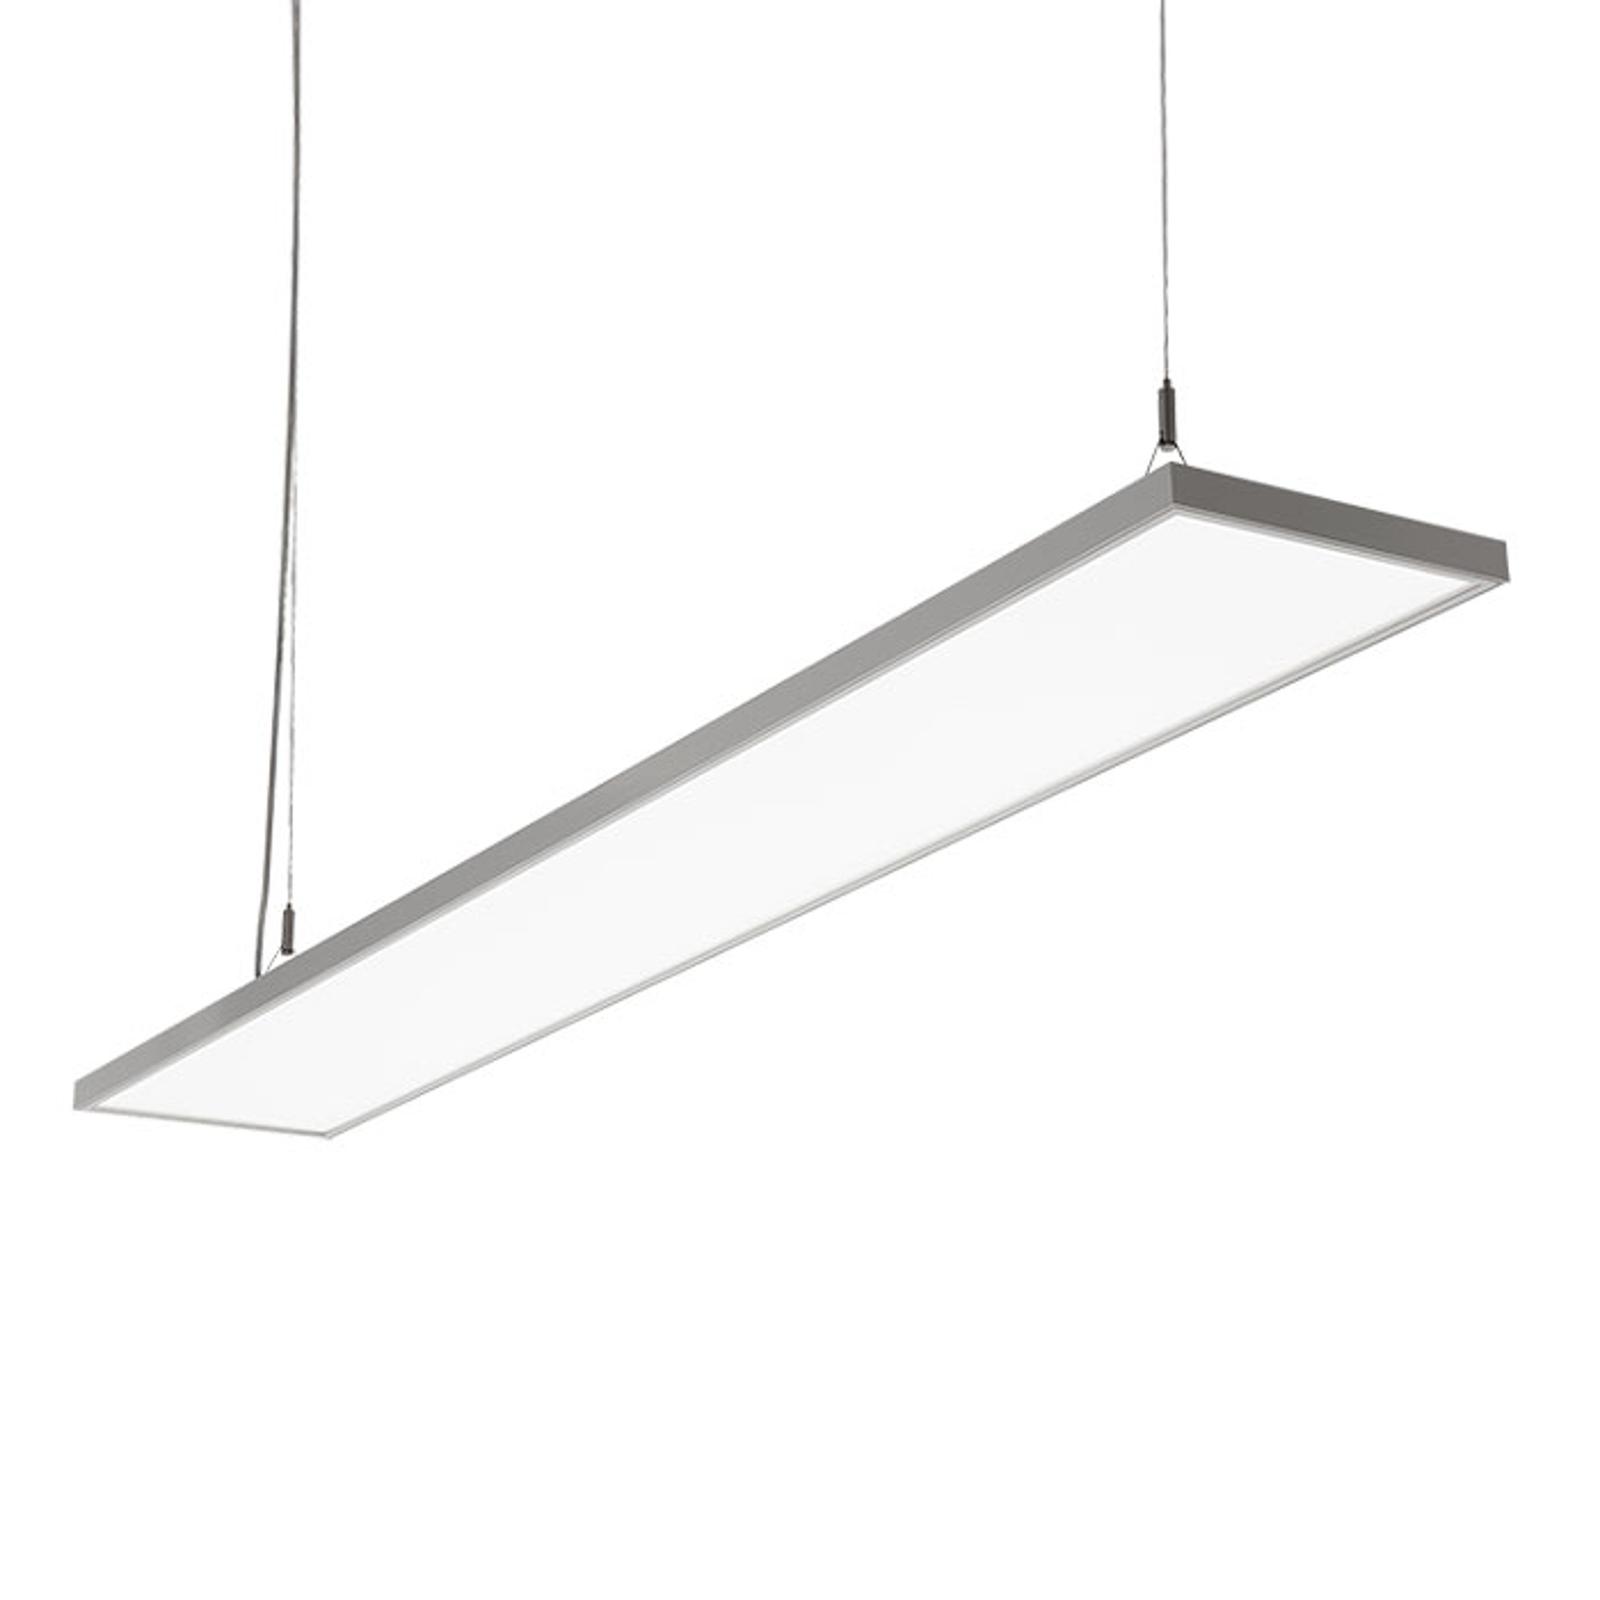 Lampa wisząca LED C95-P, srebrnoszara, 149,4 cm